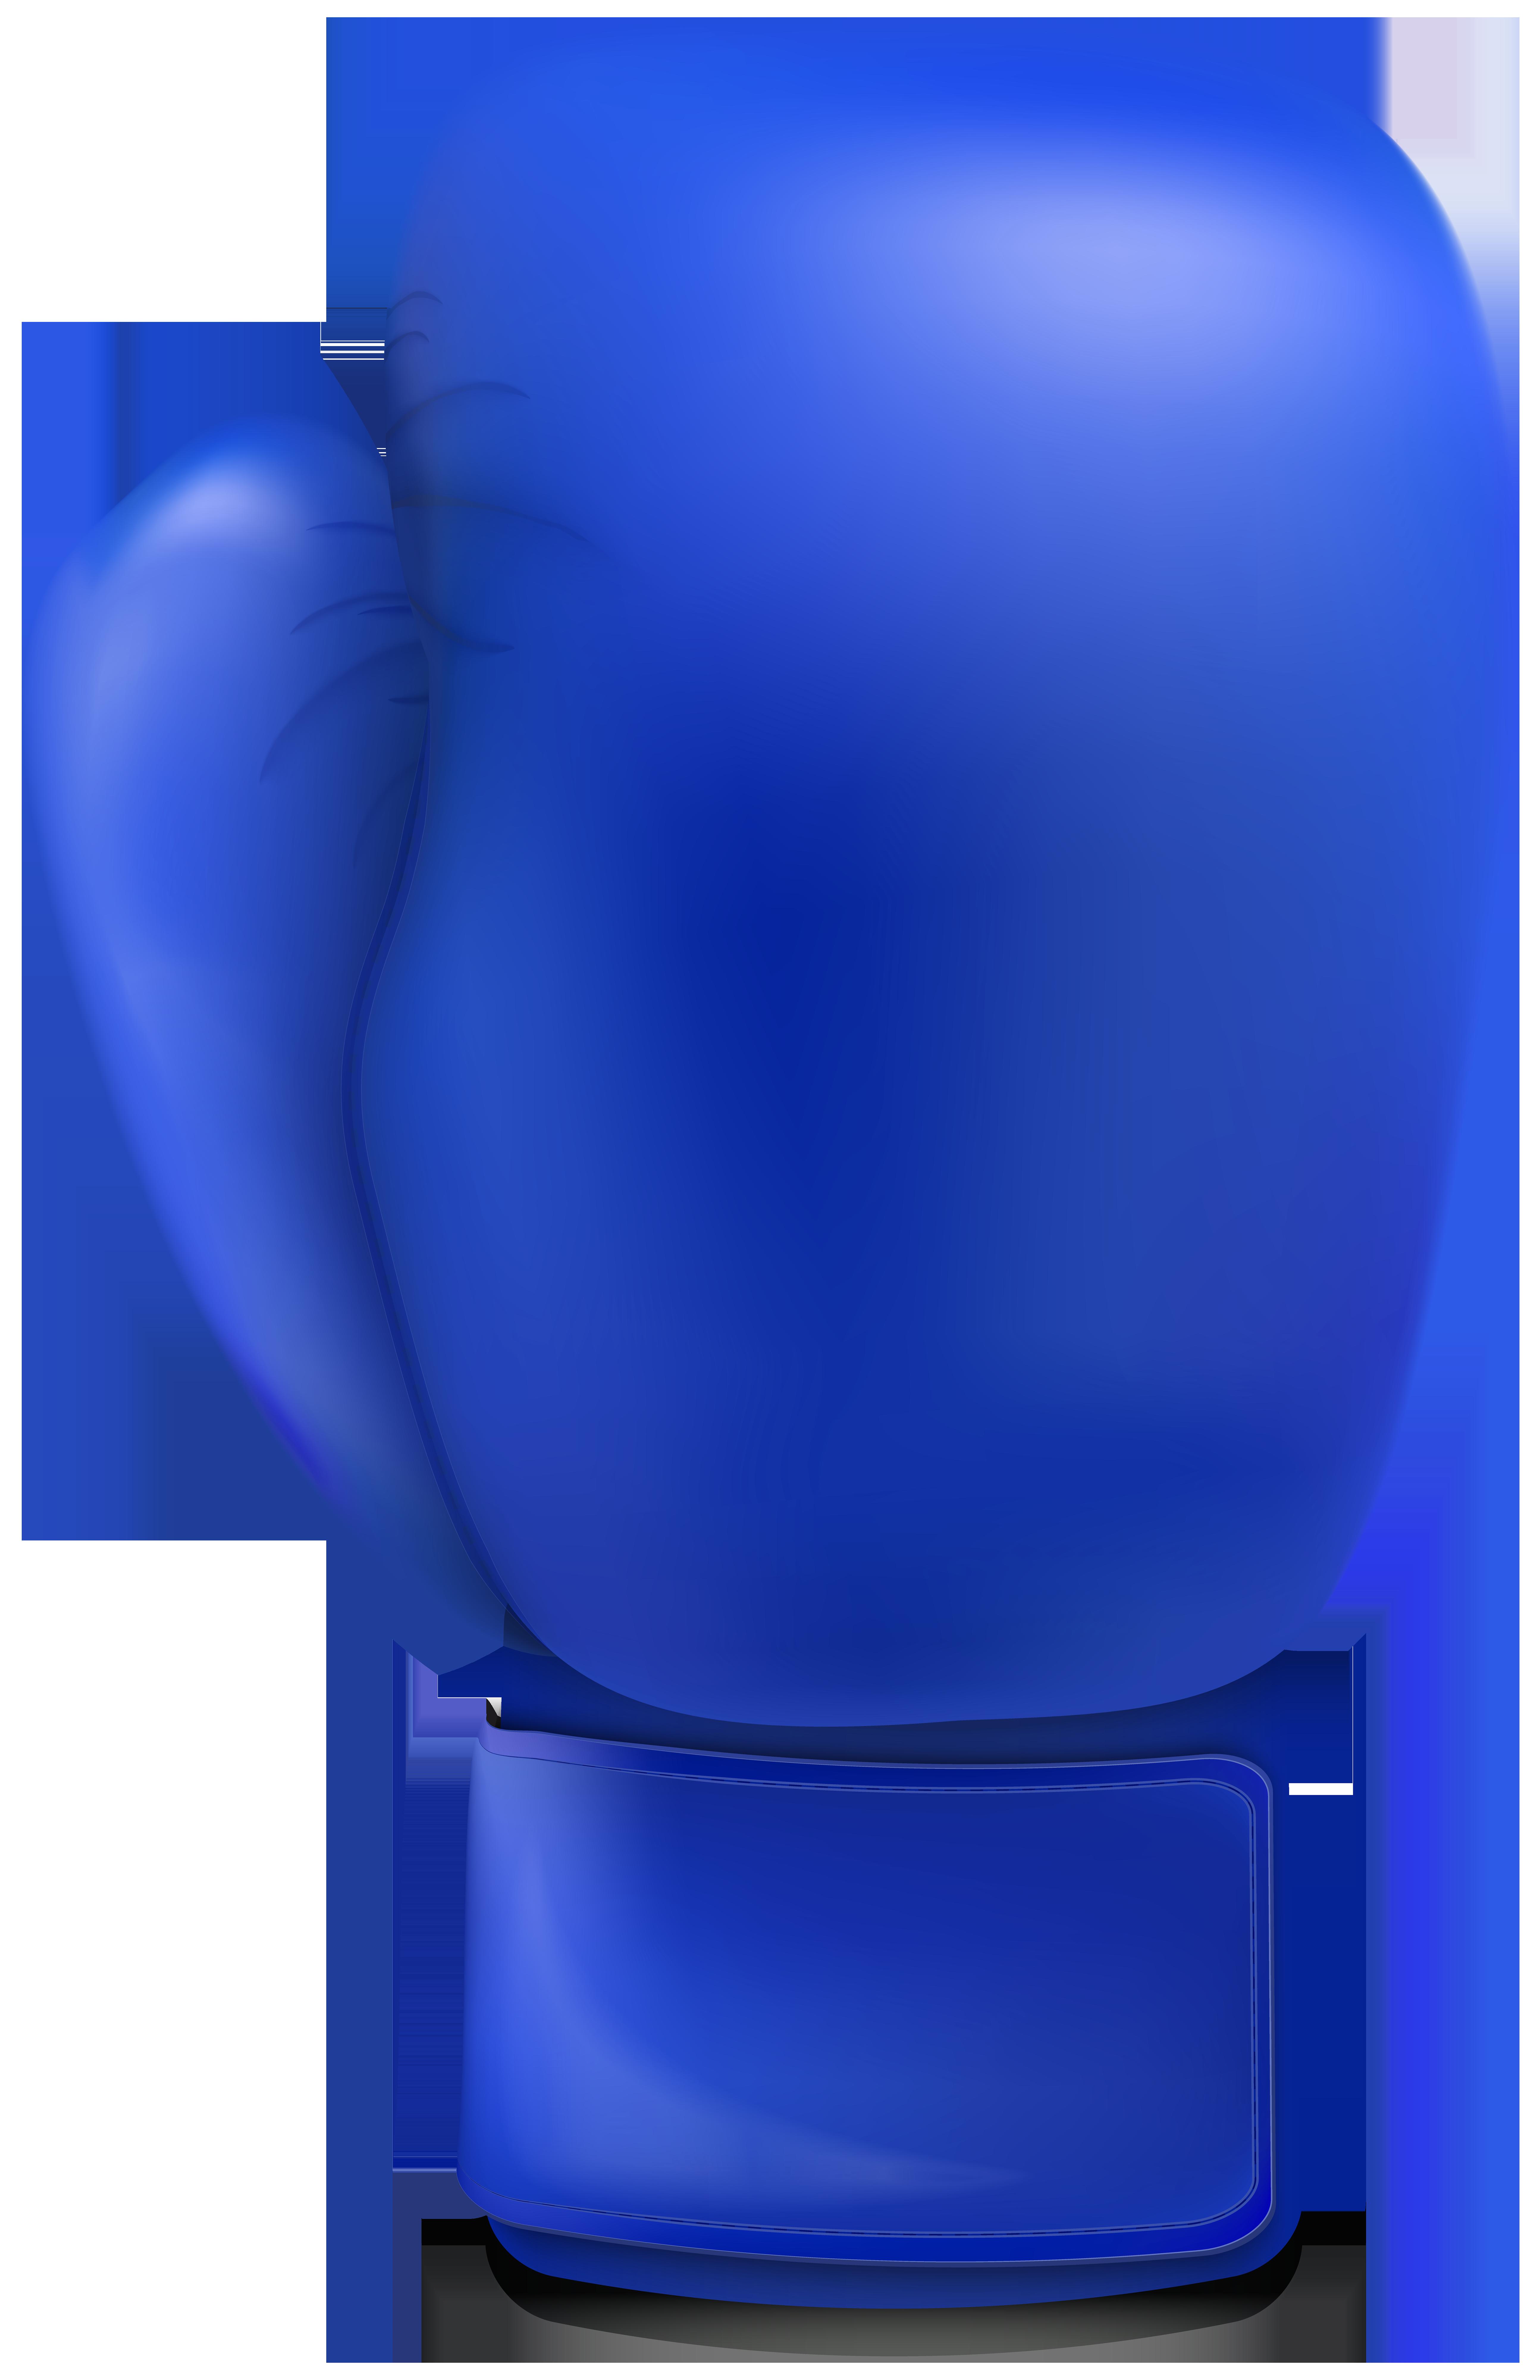 clipart transparent stock Boxing clipart blue. Glove clip art png